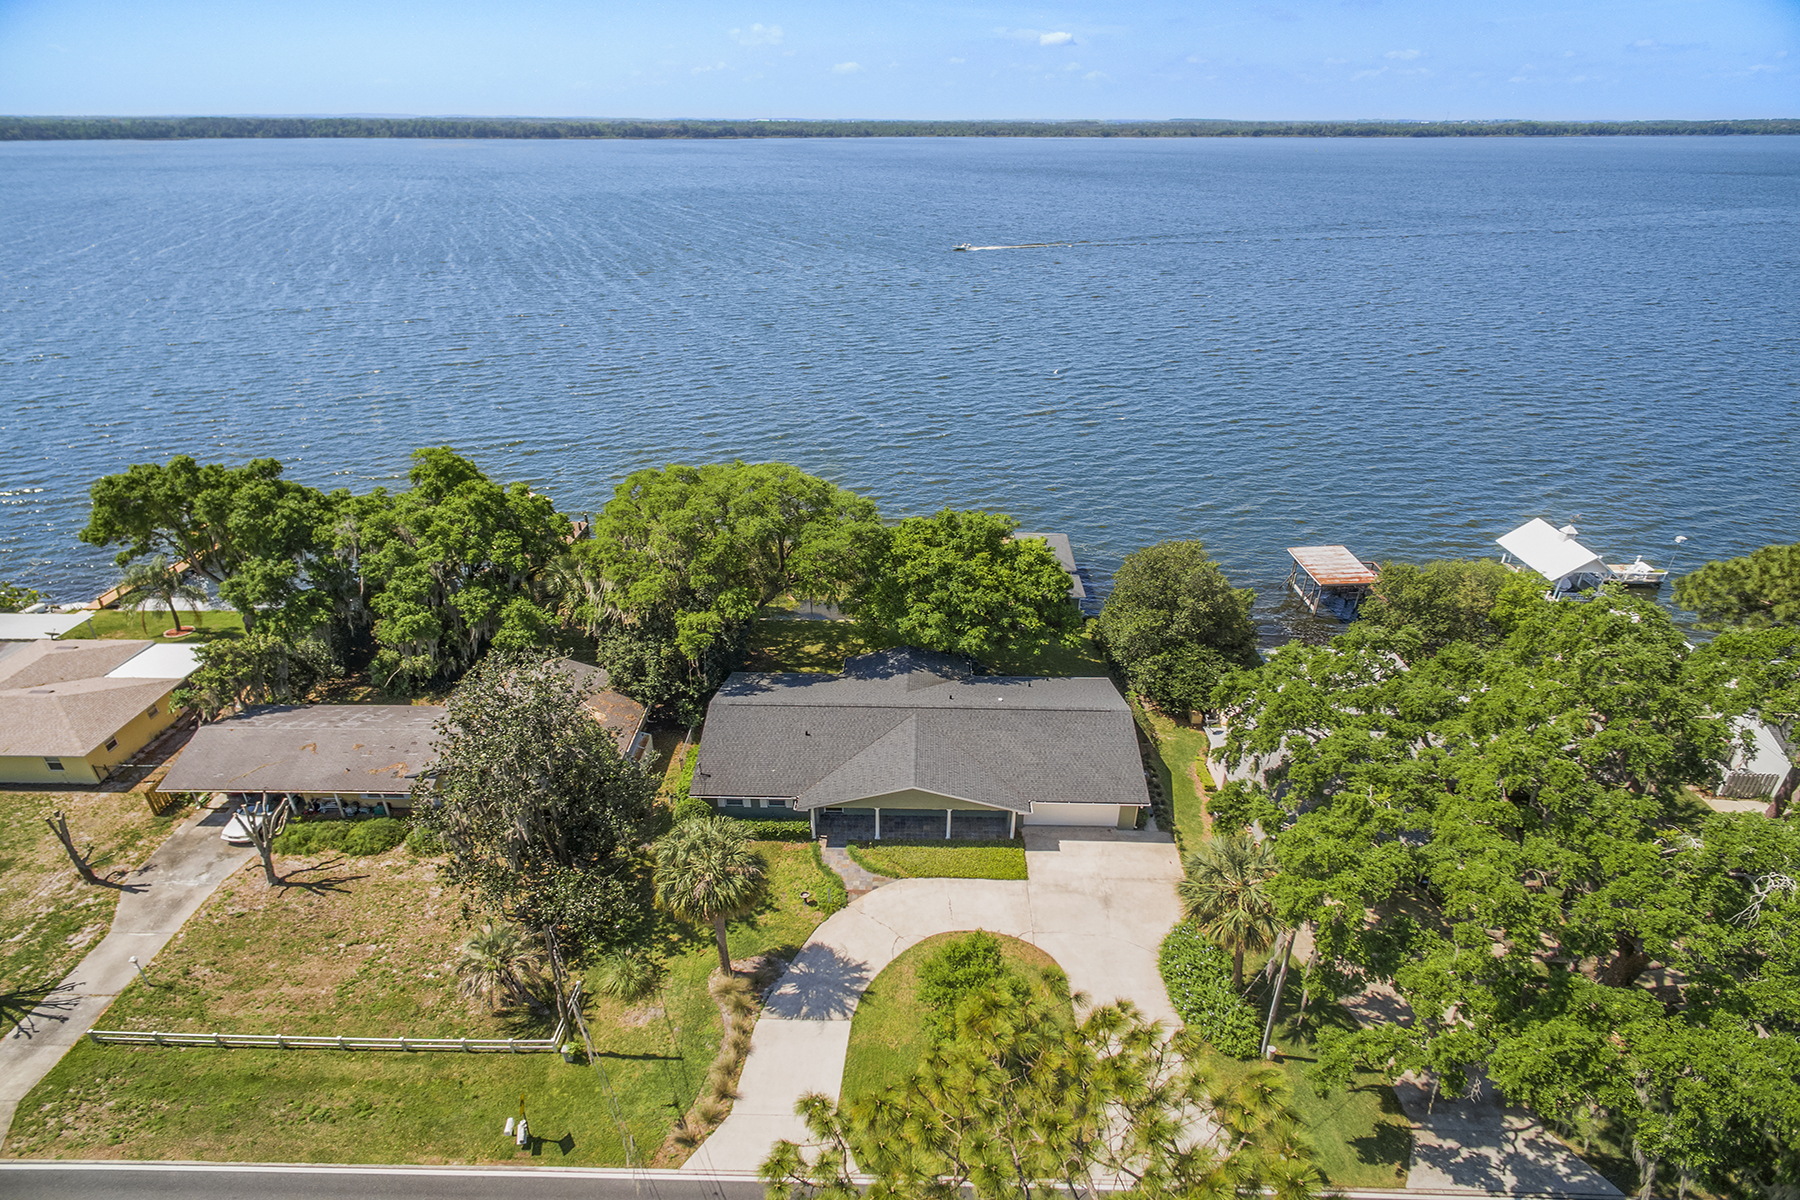 Villa per Vendita alle ore ORLANDO - TAVARES 32735 Lakeshore Dr Tavares, Florida, 32778 Stati Uniti